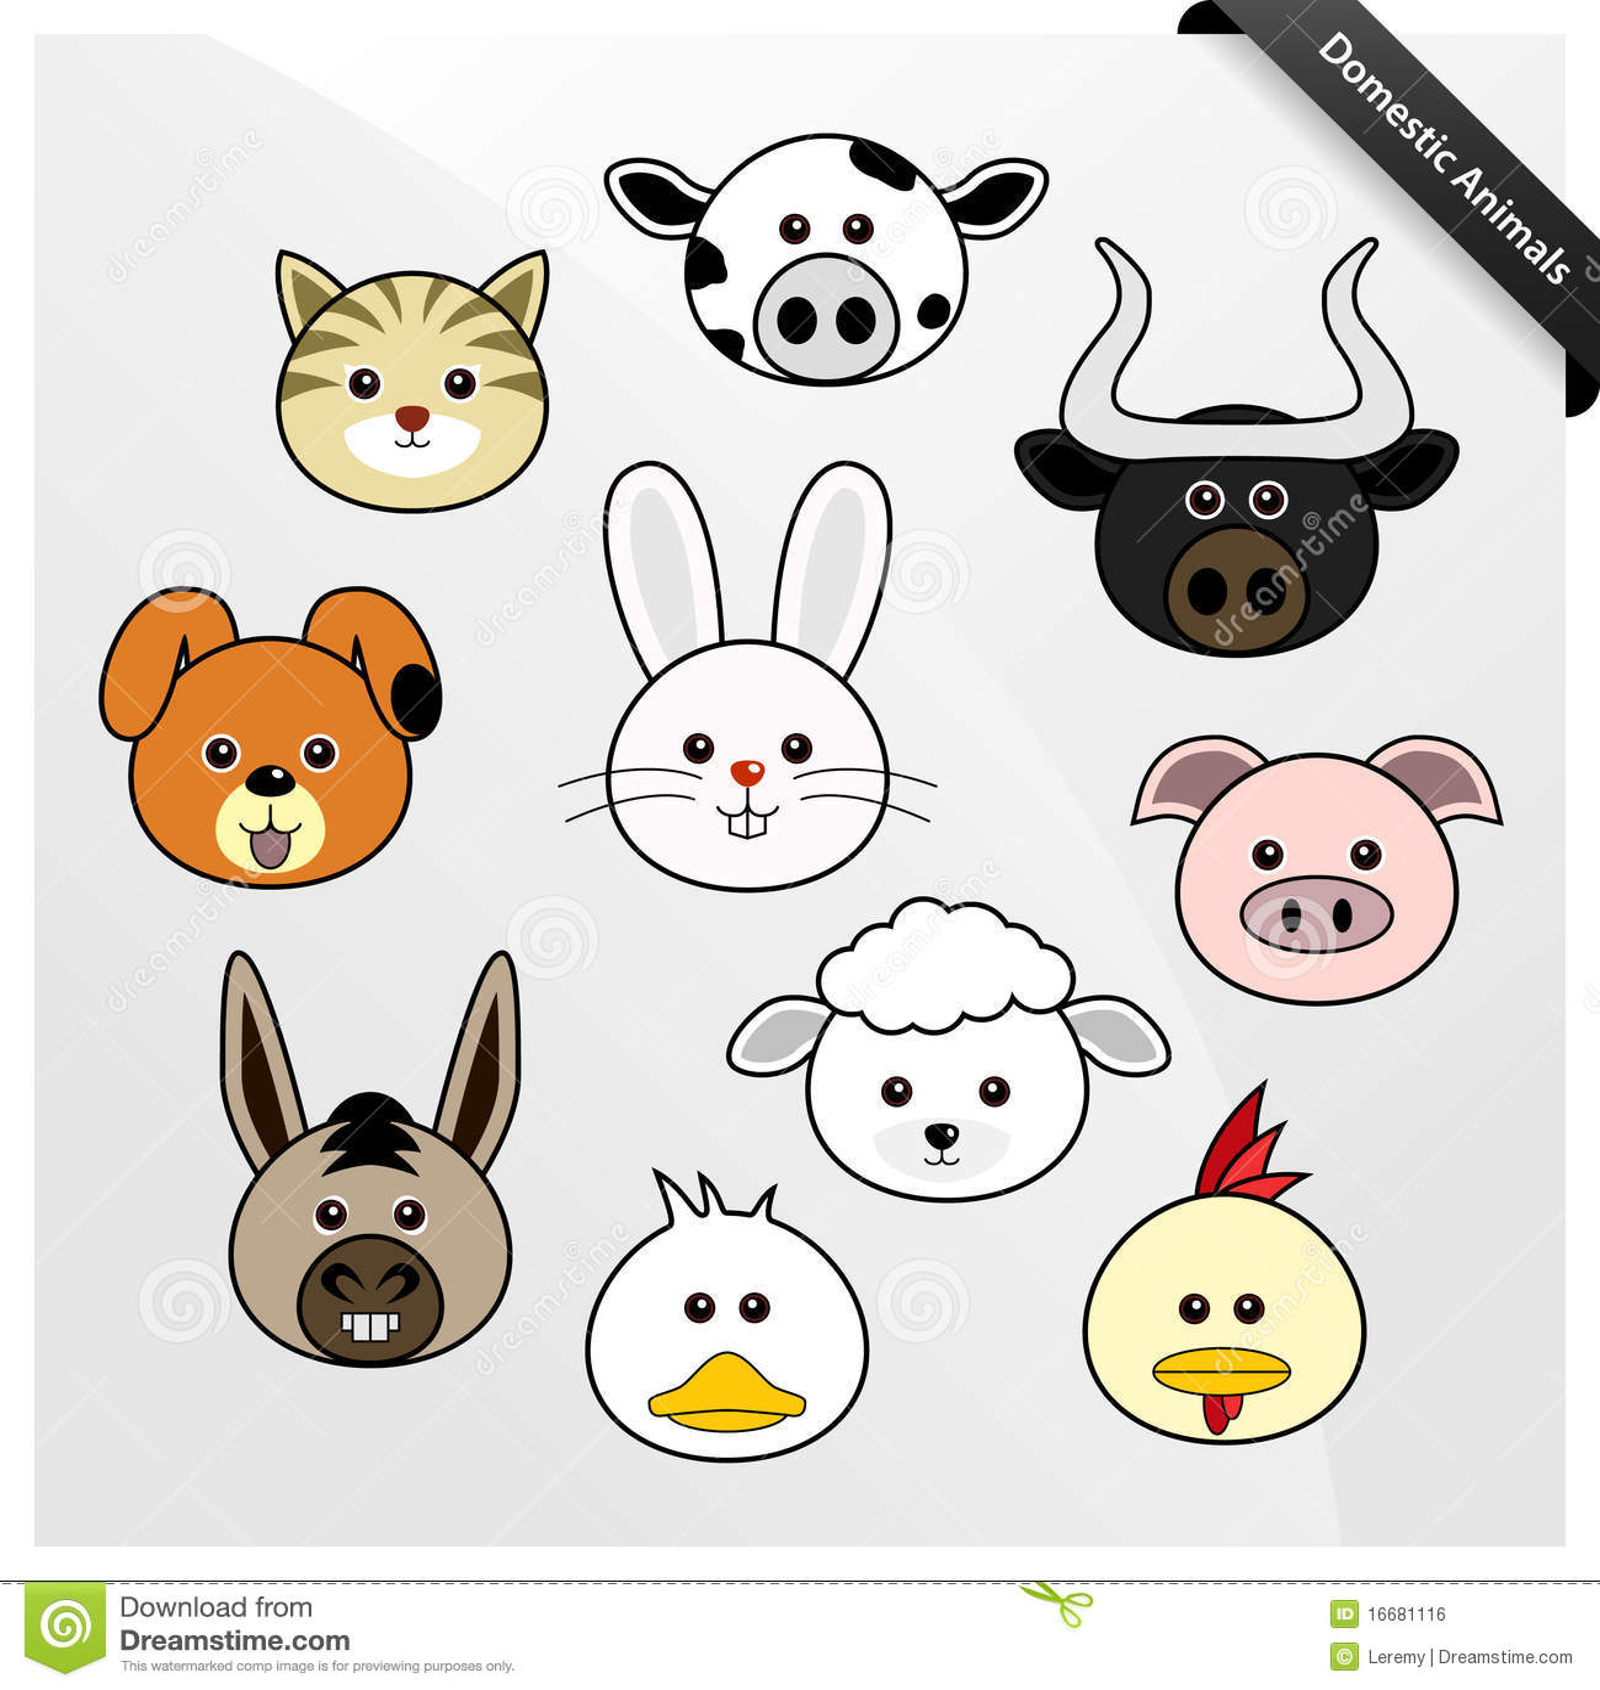 Dessin anim mignon d 39 animal domestique image libre de - Animal mignon ...